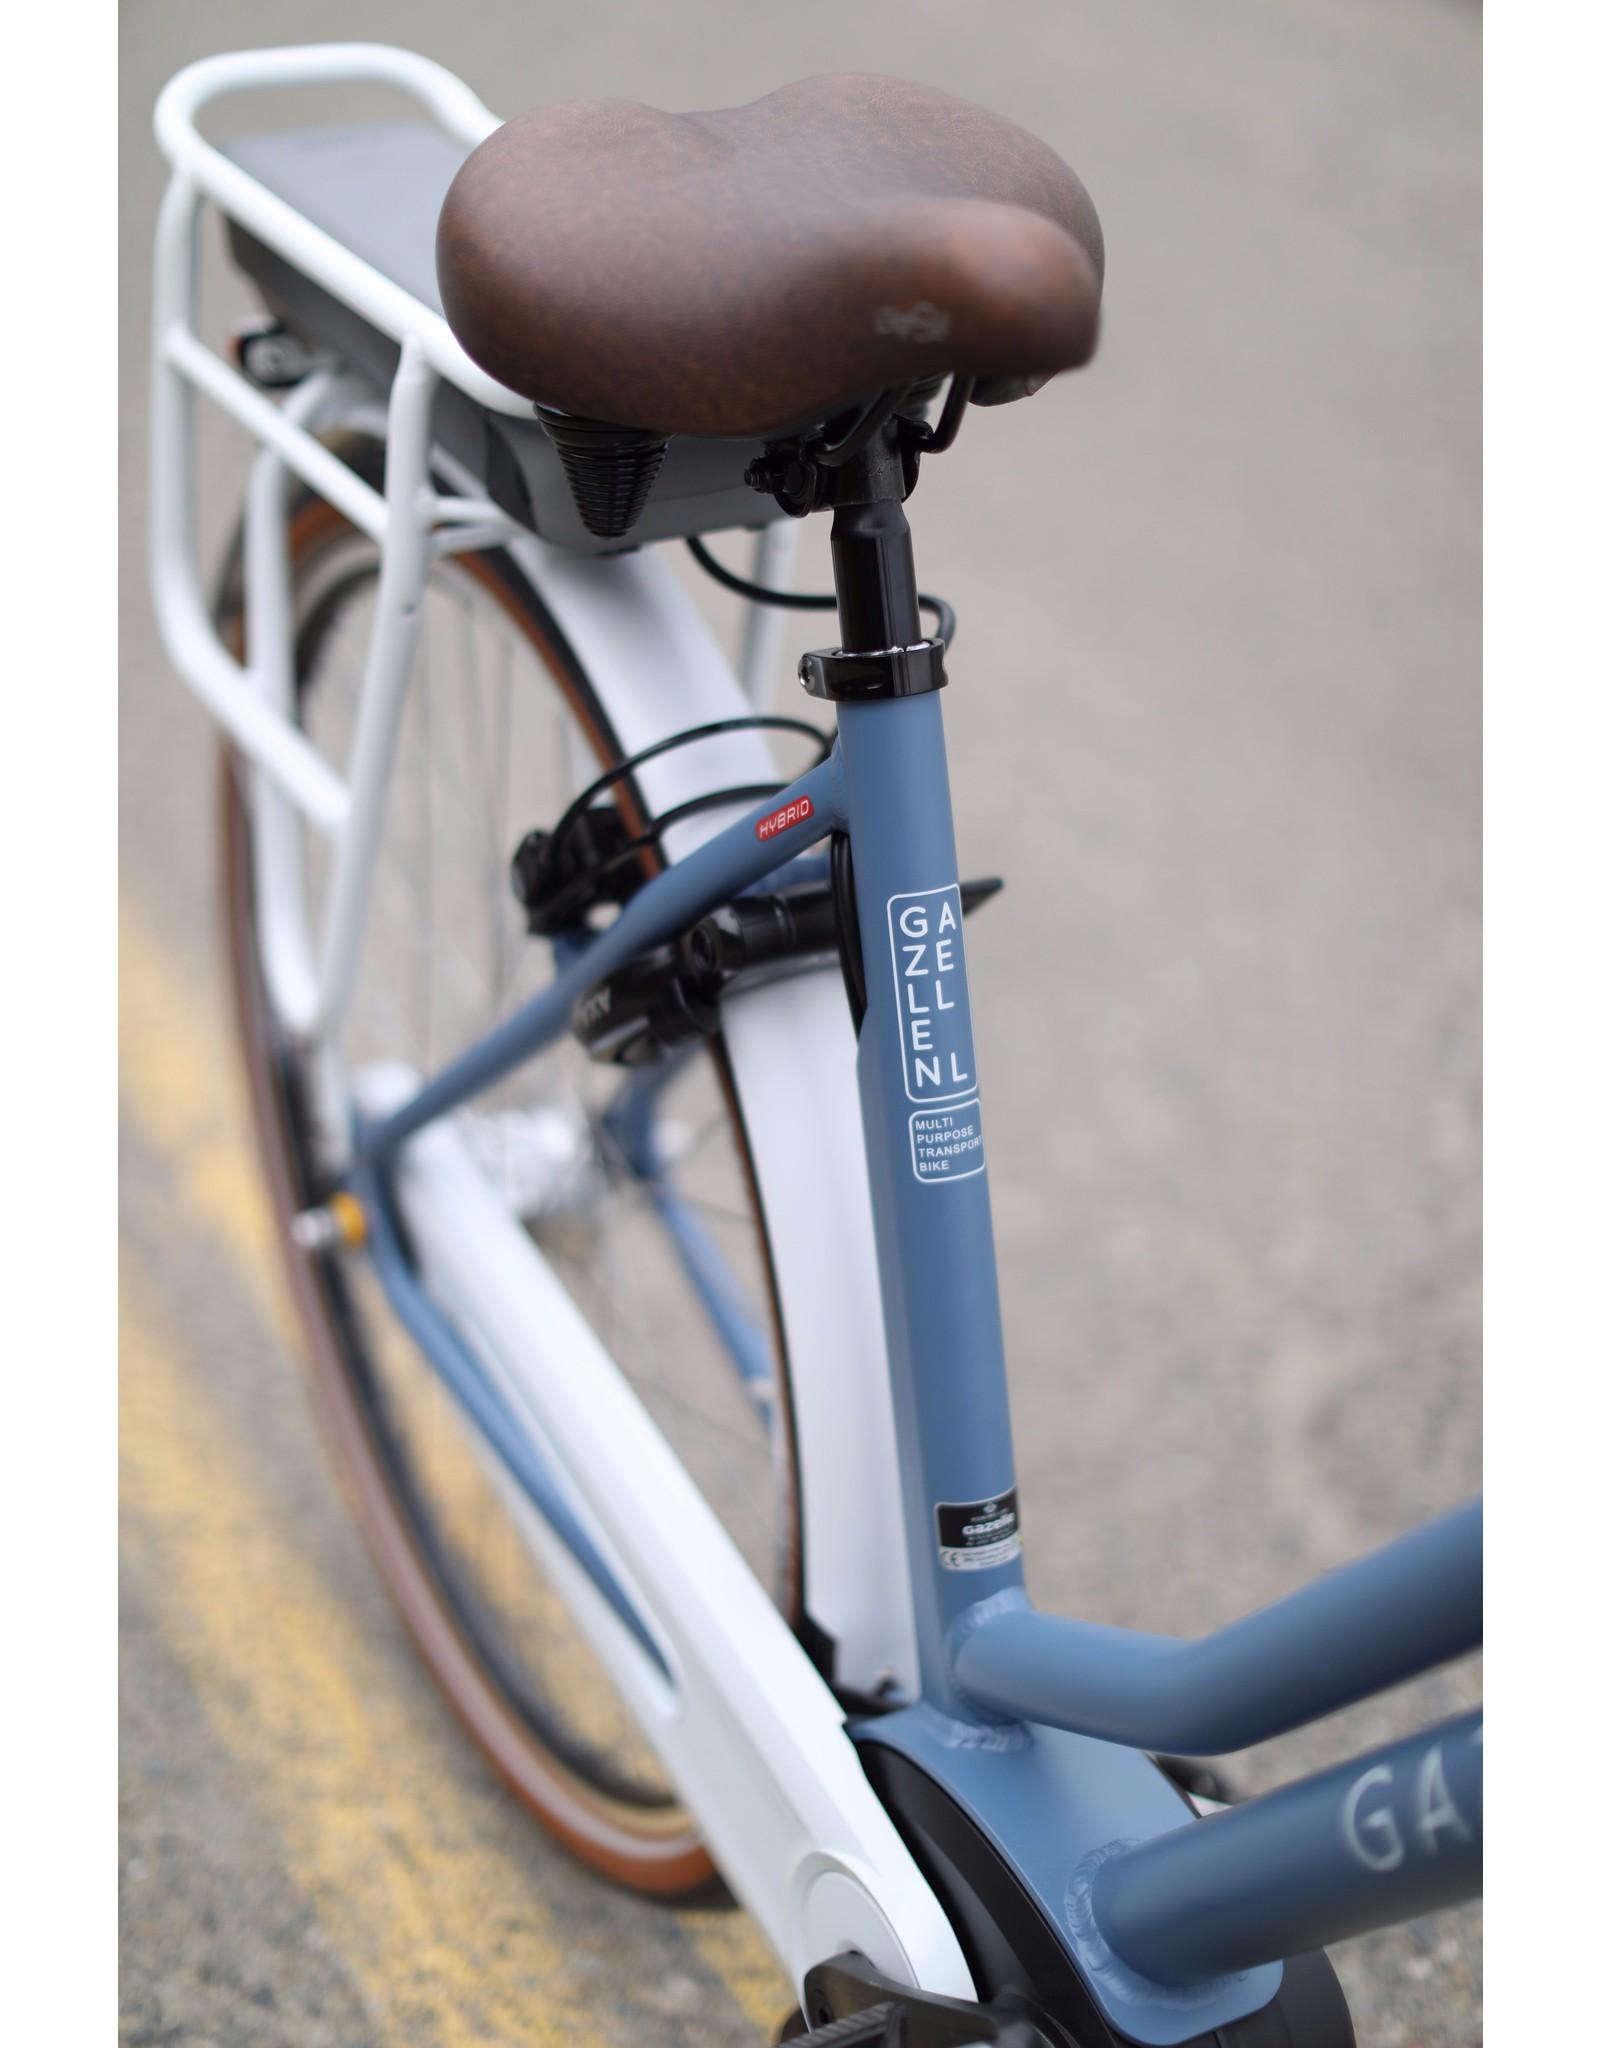 GAZELLE GAZELLE NL C8-Iced blue gloss